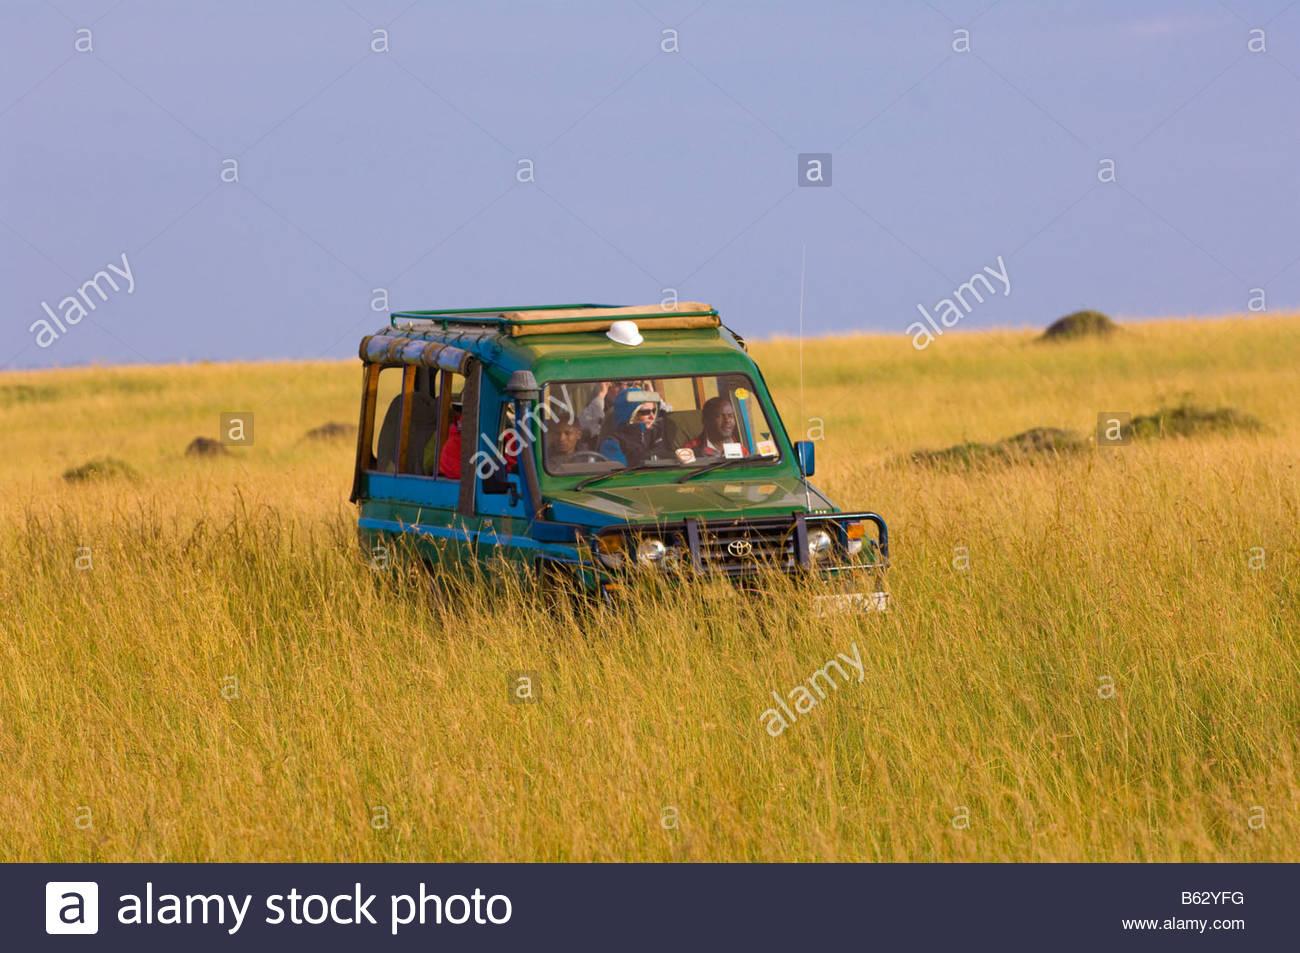 A safari vehicle touring Masai Mara National Reserve Kenya - Stock Image